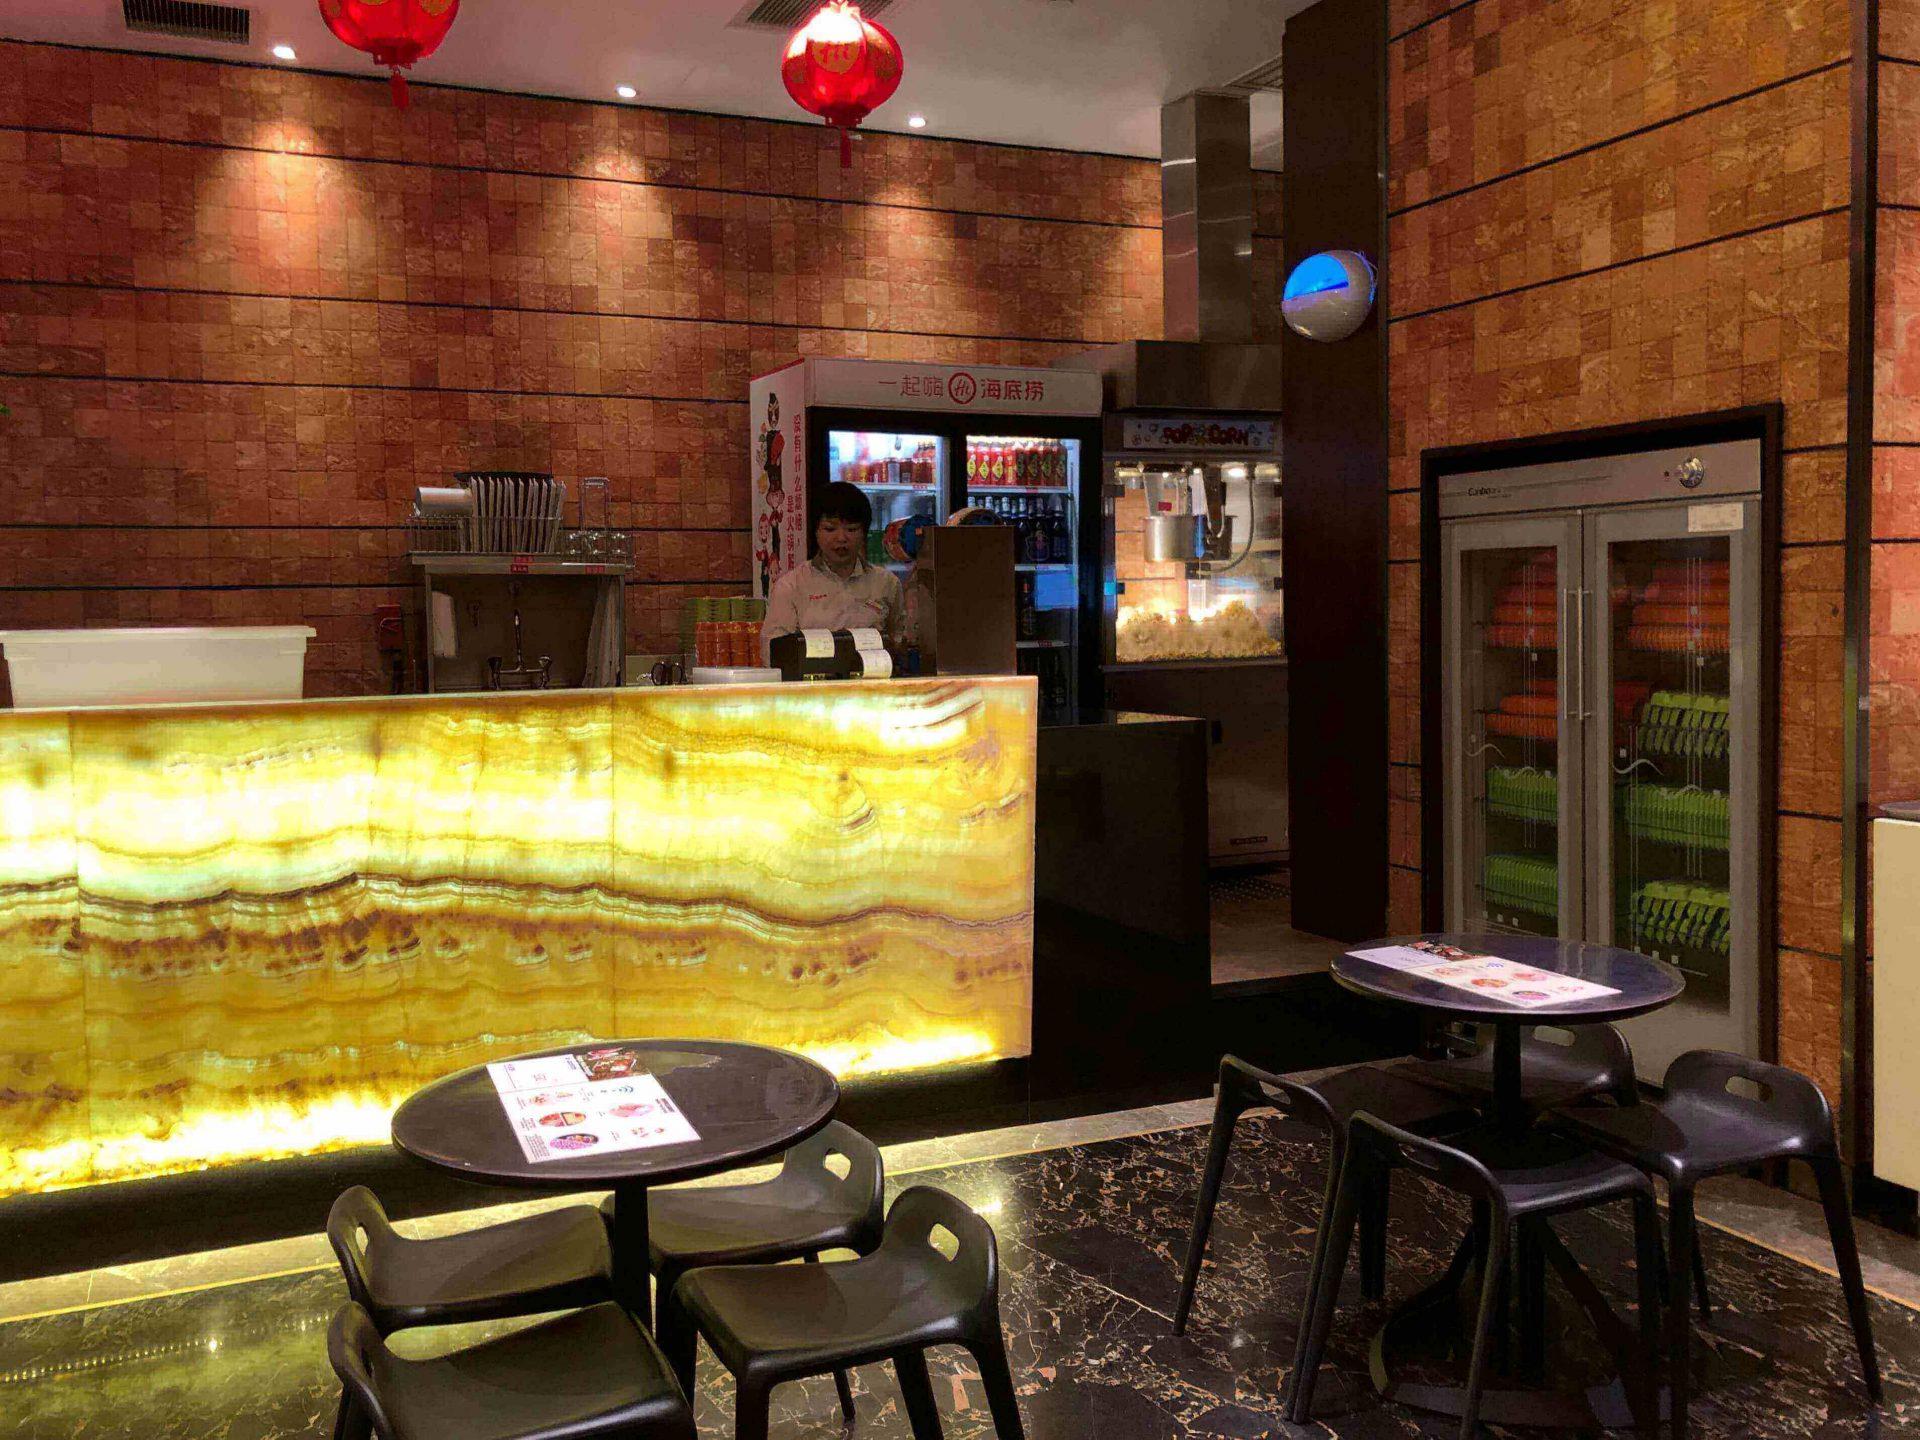 the drink bar for waiting customers at Haidilao Singapore